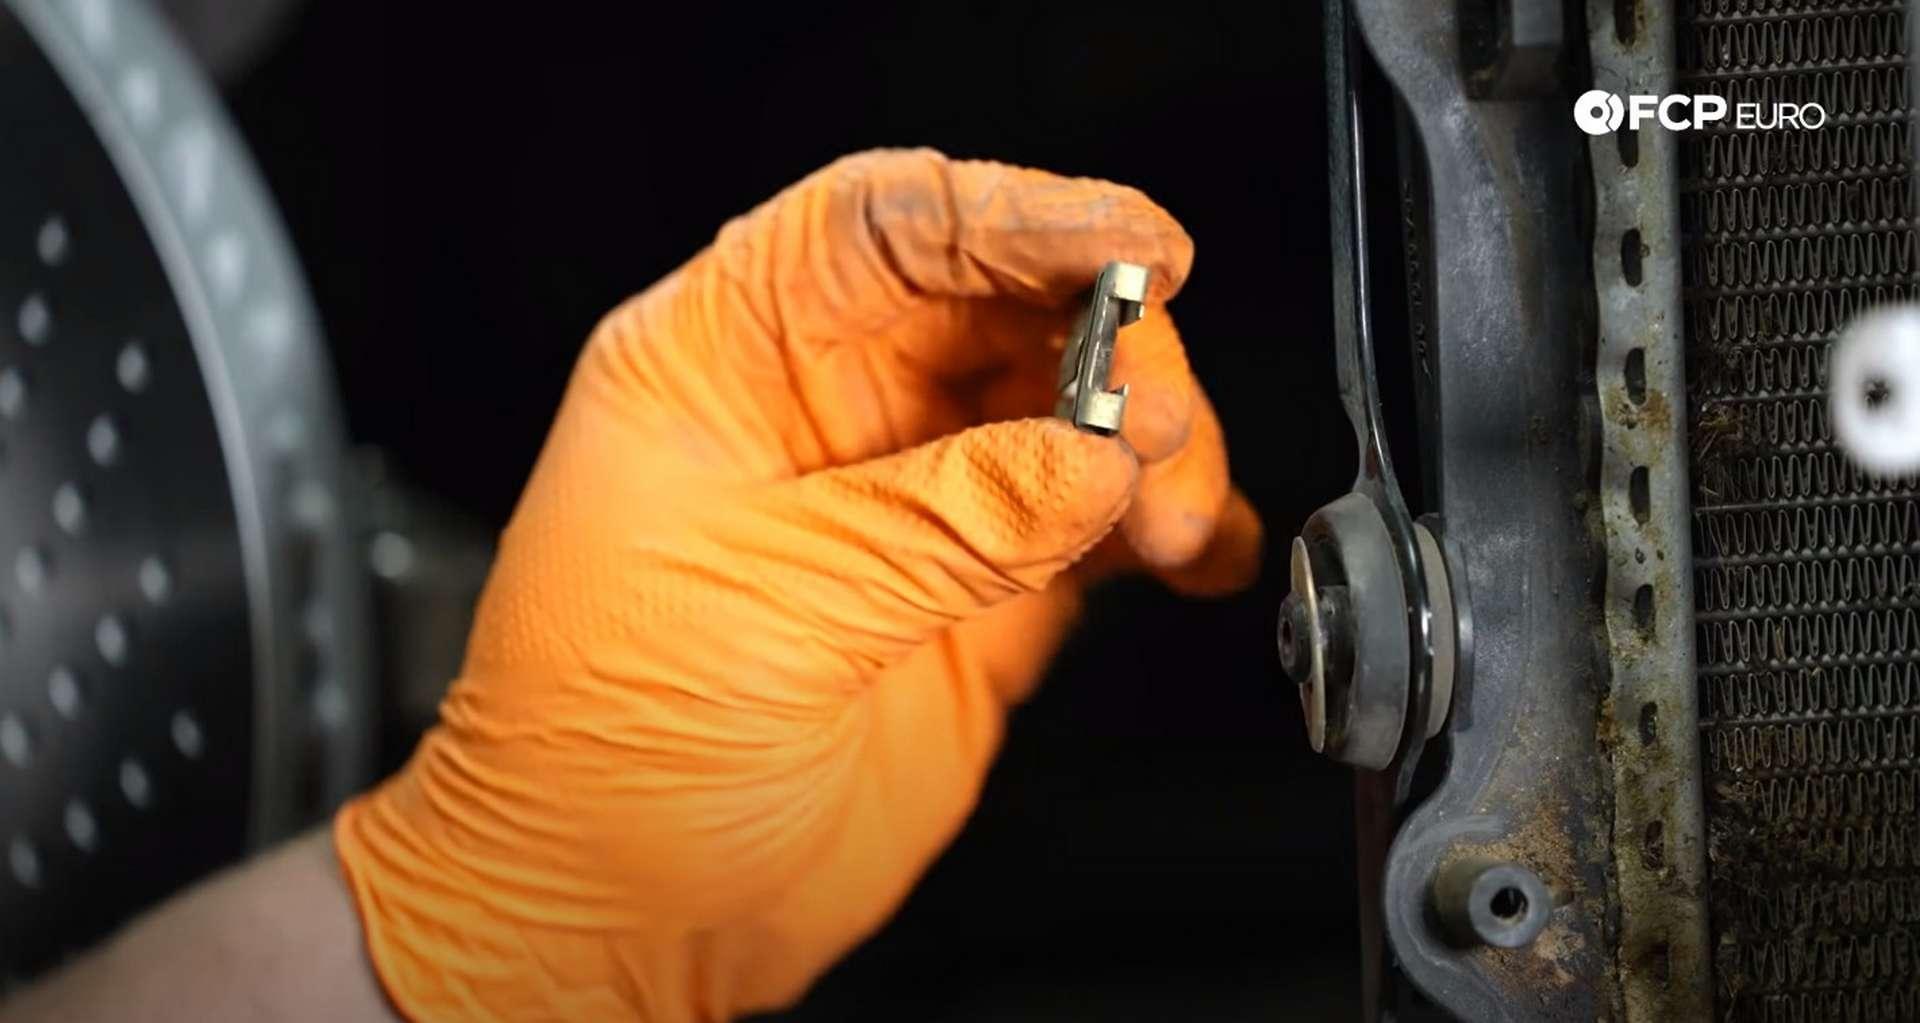 DIY Porsche 996 Radiator Replacement removed radiator bracket clips